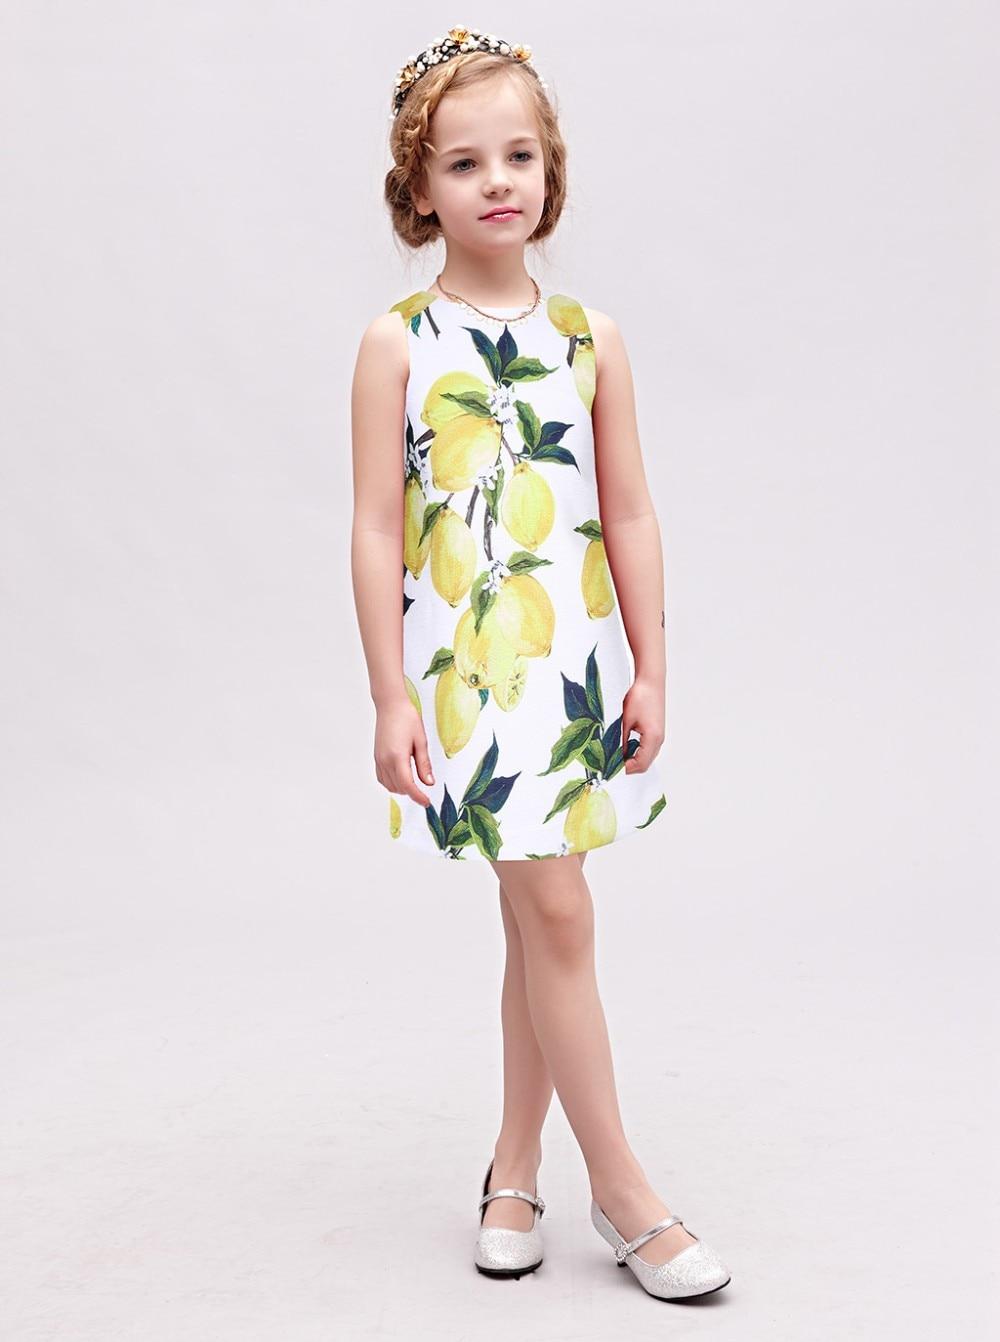 WL MONSOON Baby Girl Dress Brand Girls Summer Dress Kids Costume With Lemon Floral Print Wedding Dress Girl Vetement Fille 3-12Y w l monsoon baby girls autumn dress long